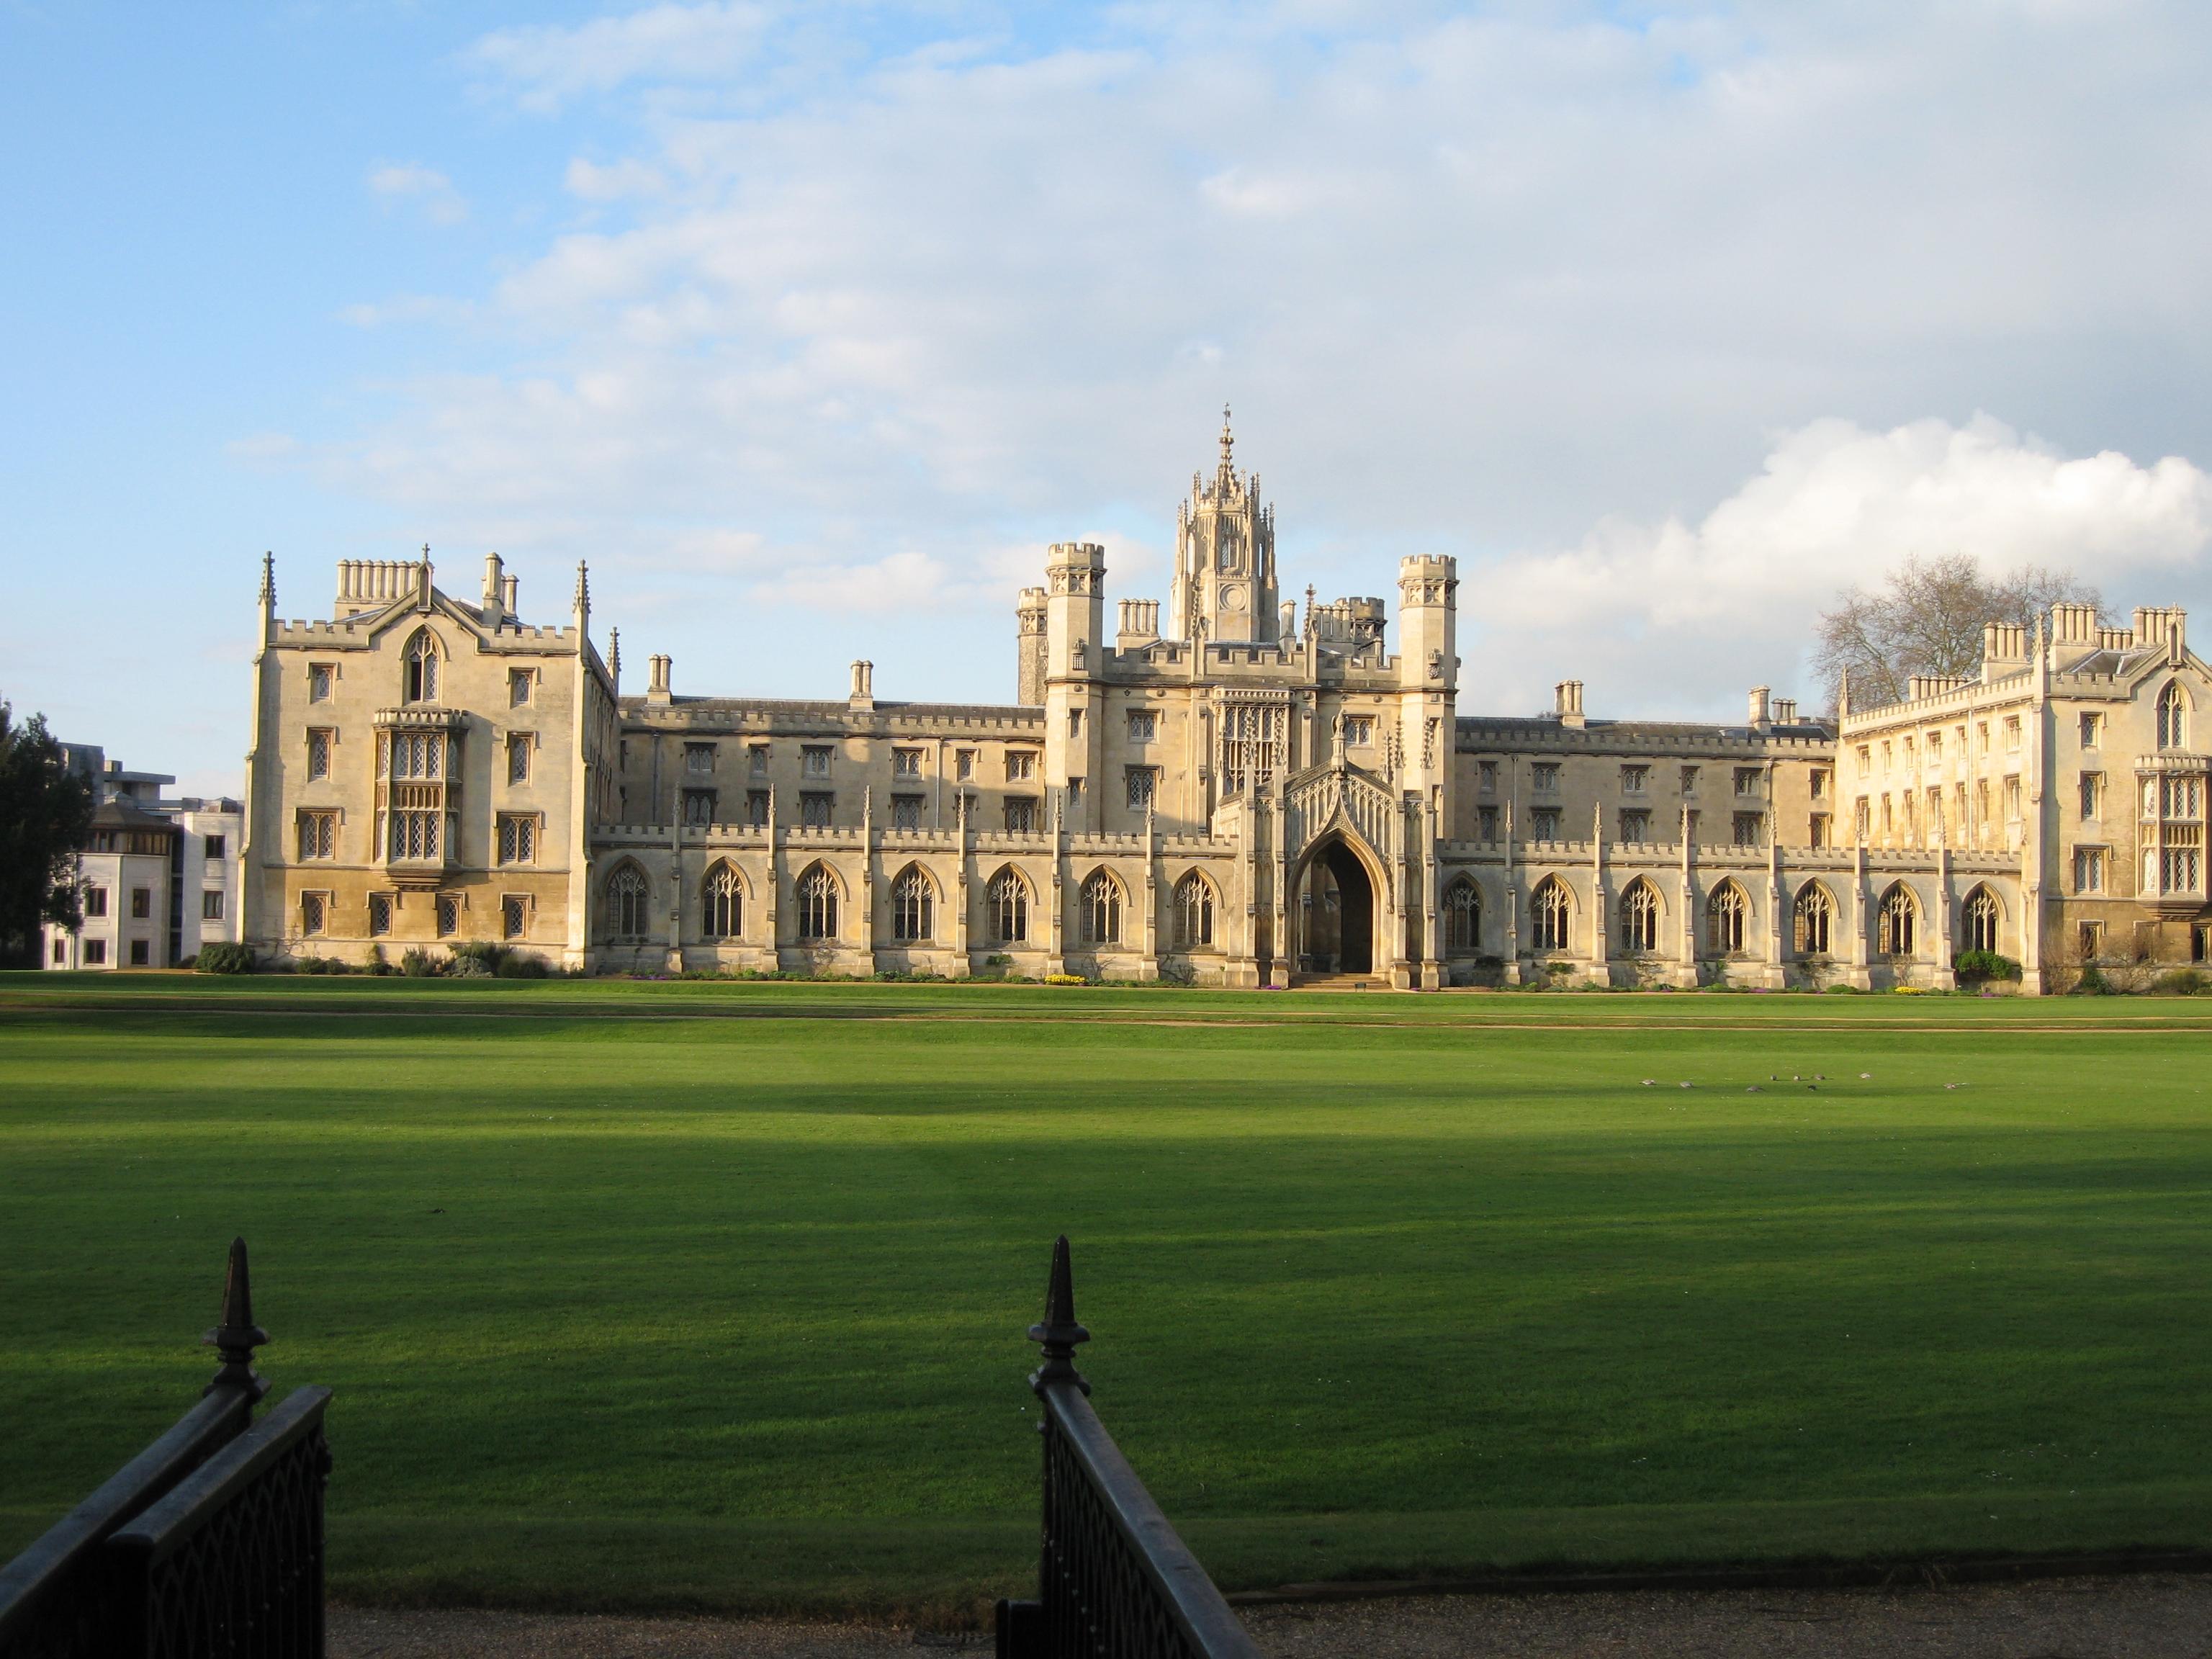 File:St John's College, Cambridge, 2008-03-31 (1).jpg - Wikimedia ...